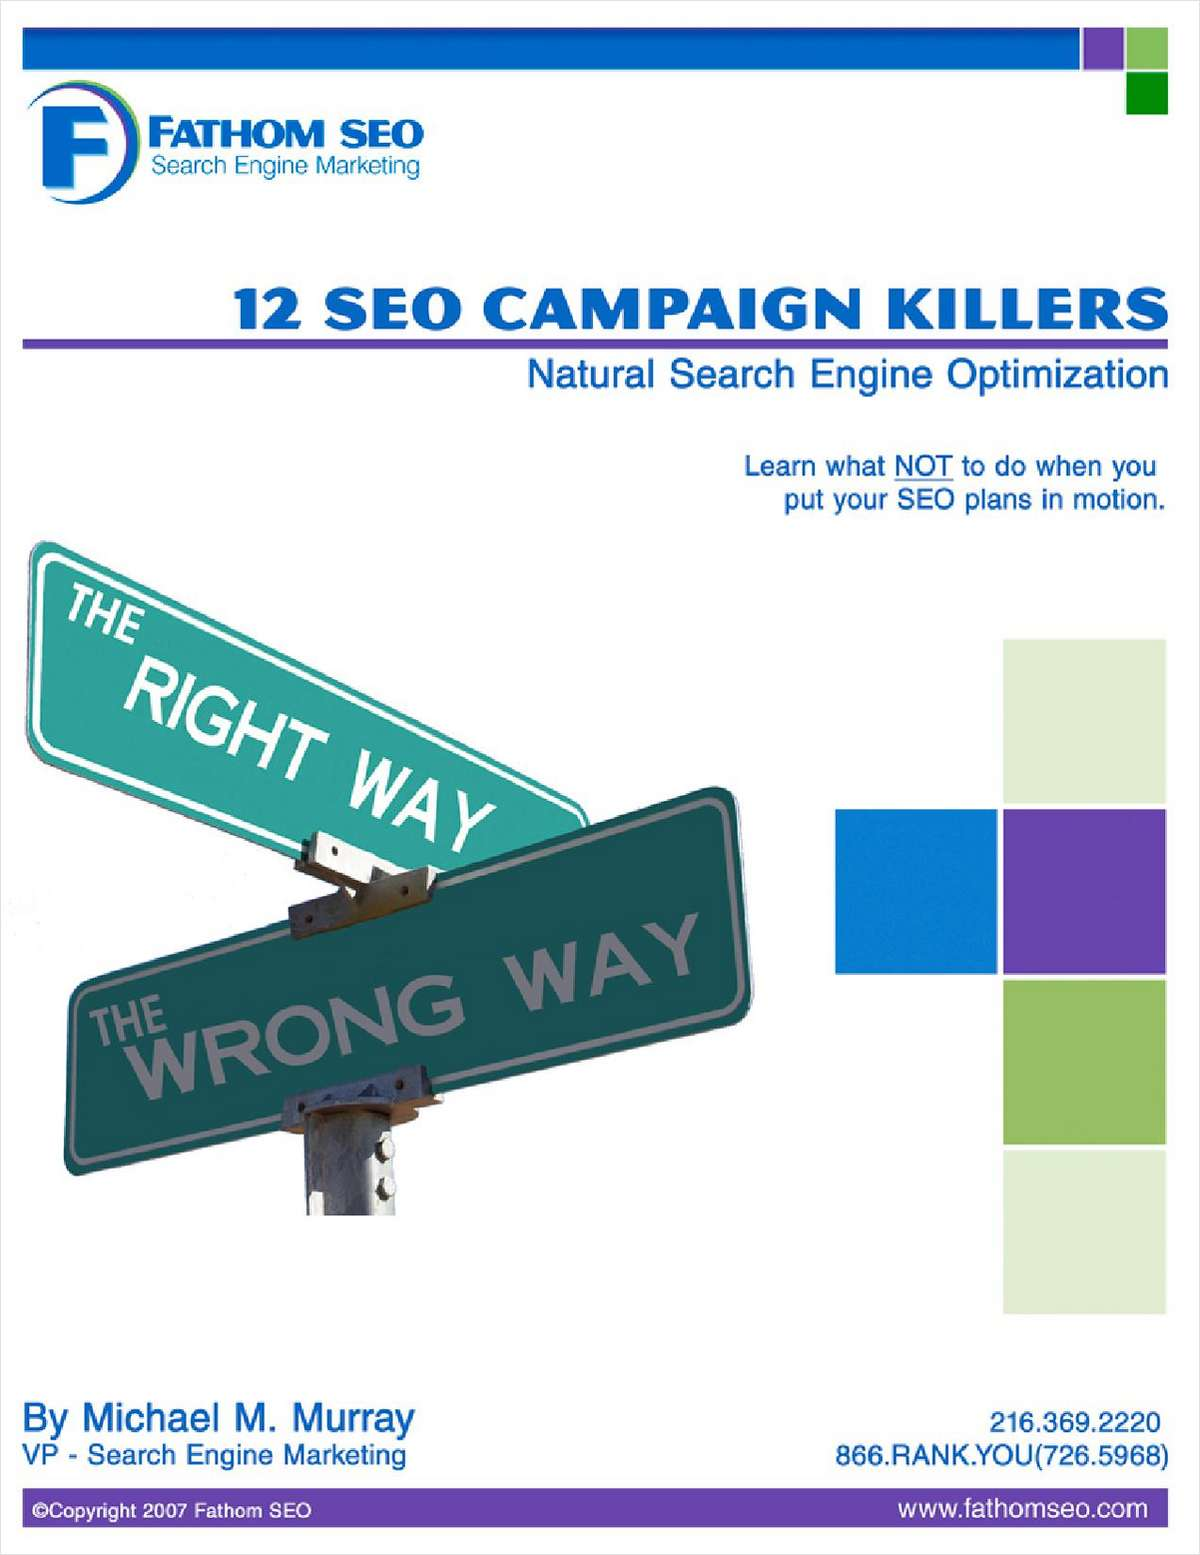 12 SEO Campaign Killers